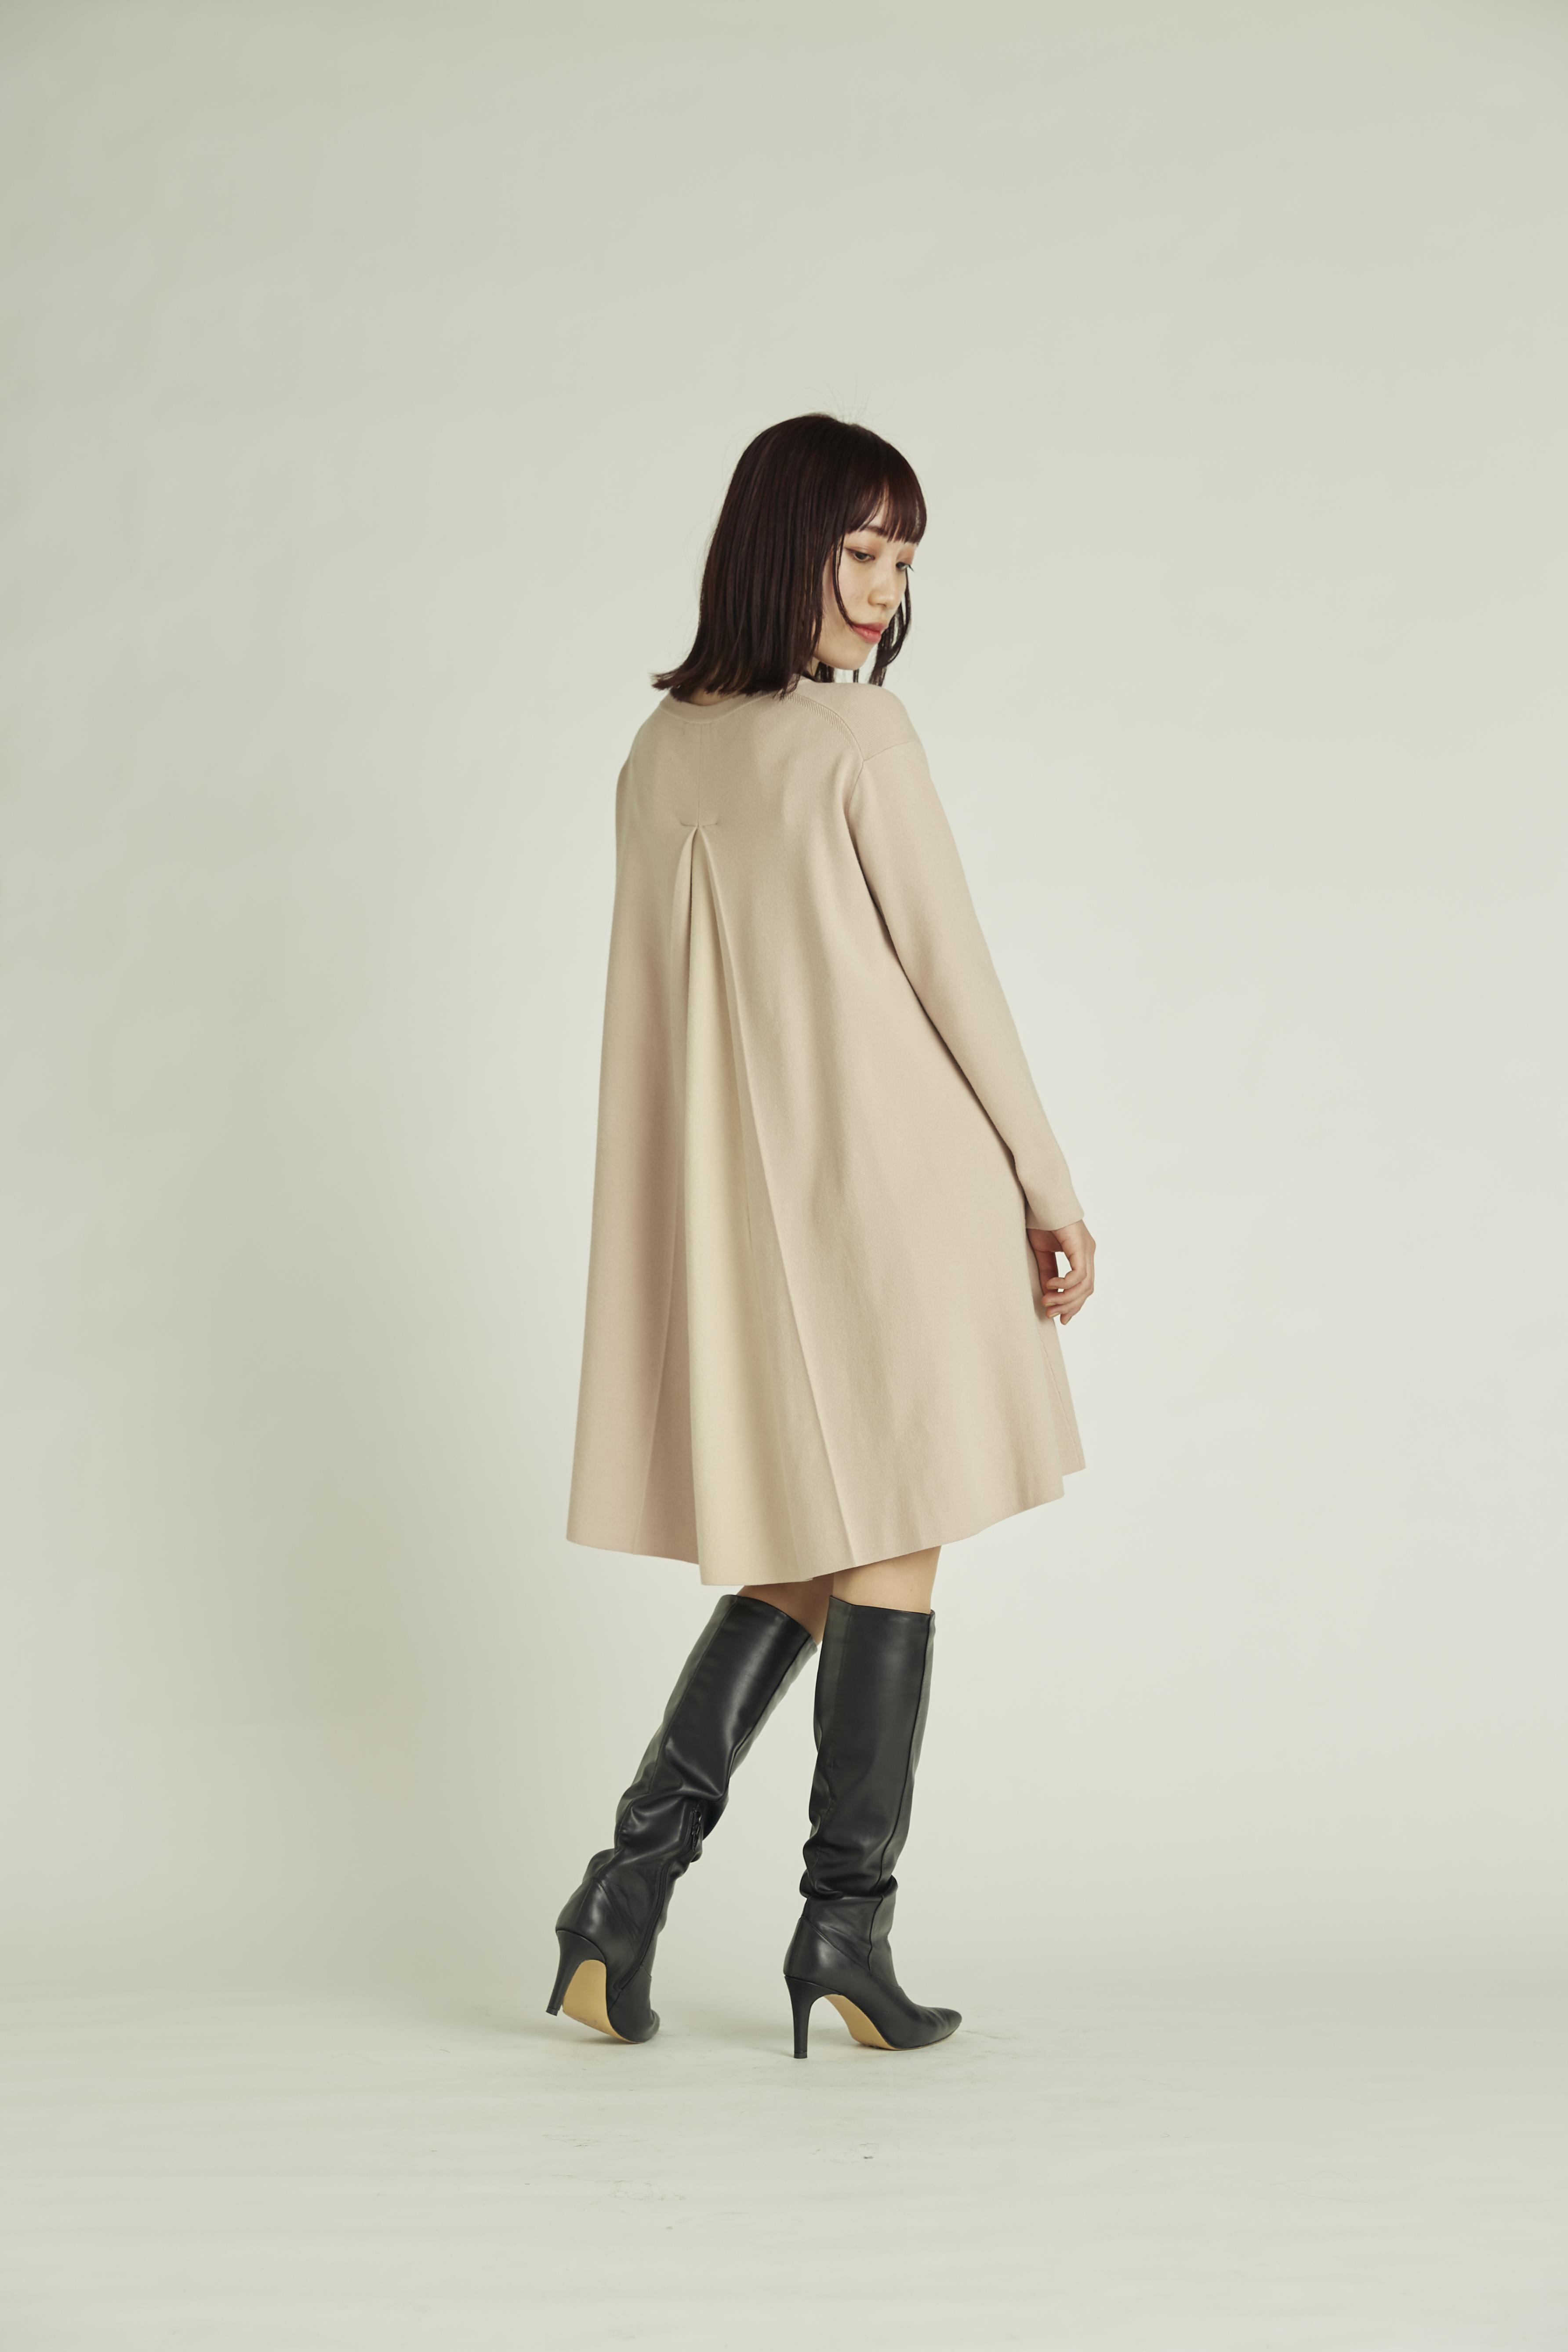 【NEW Year Special Knit Dress】バイカラーAラインニットワンピース(PBEG-36)